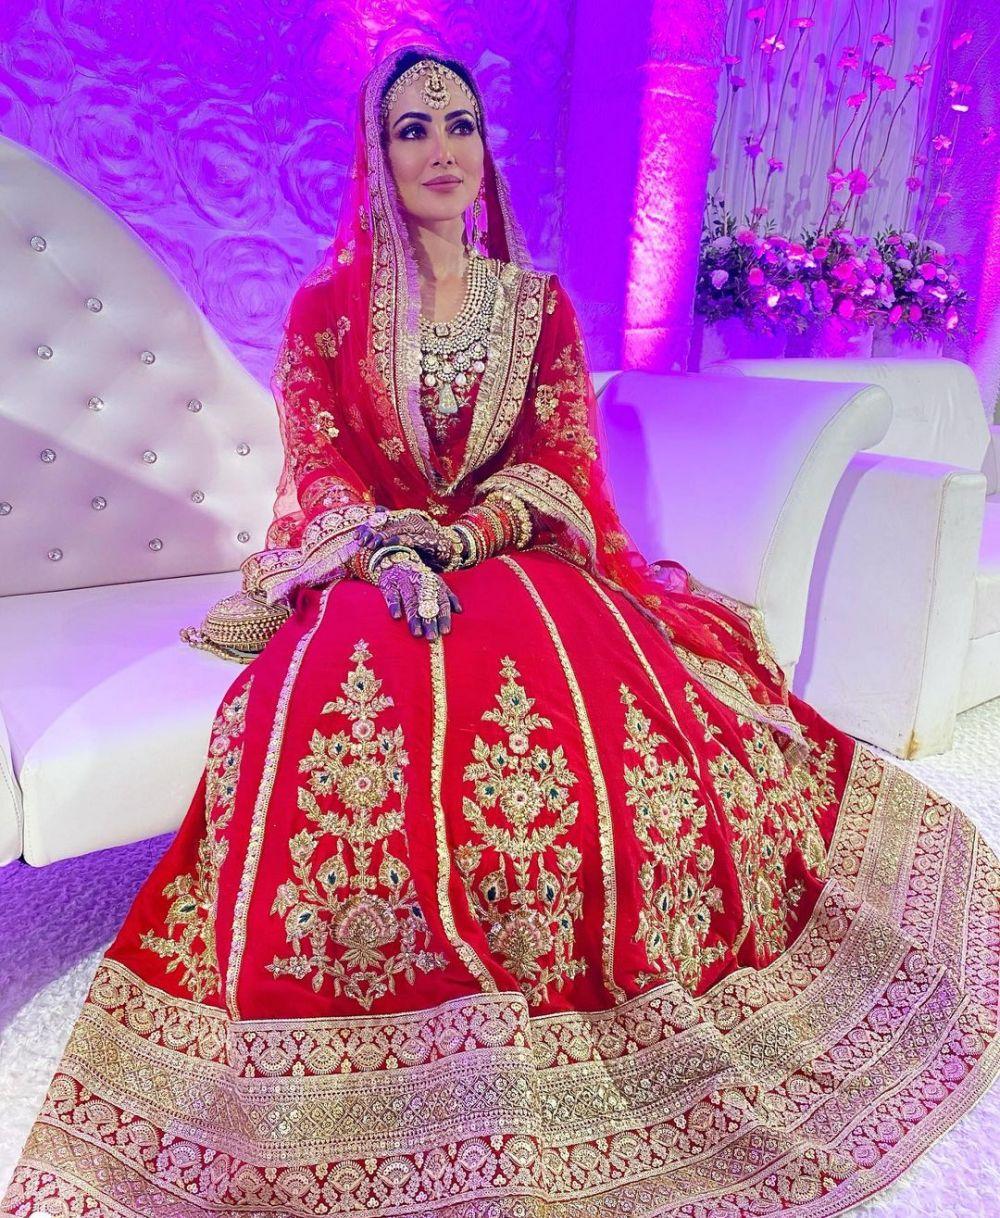 Potret pernikahan Sana Khan © 2020 brilio.net/ Instagram